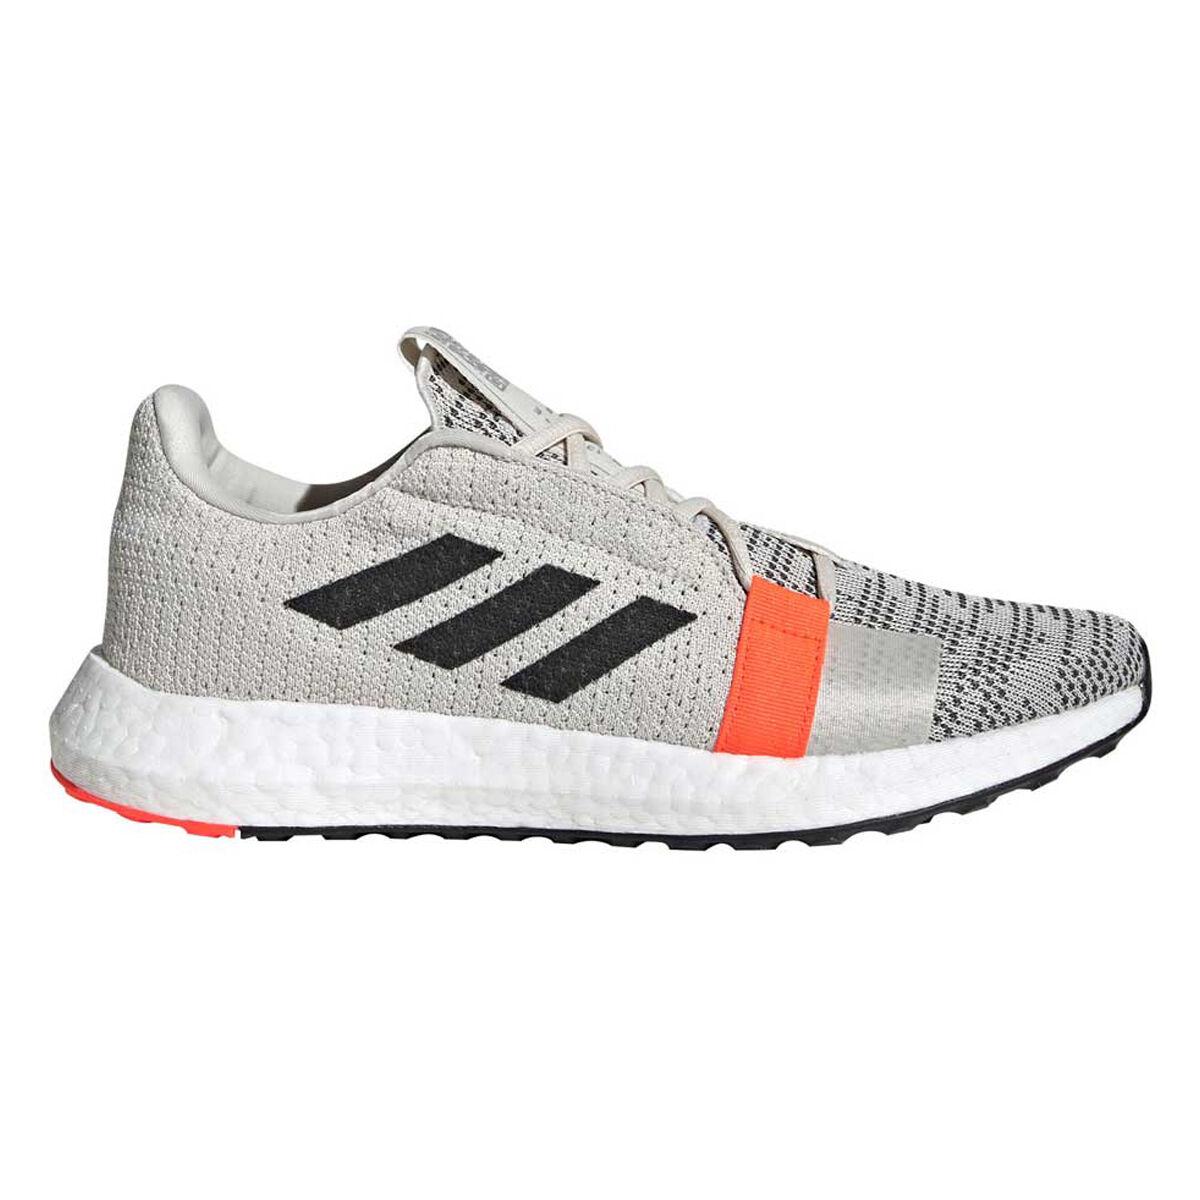 Go Womens Running Shoes White